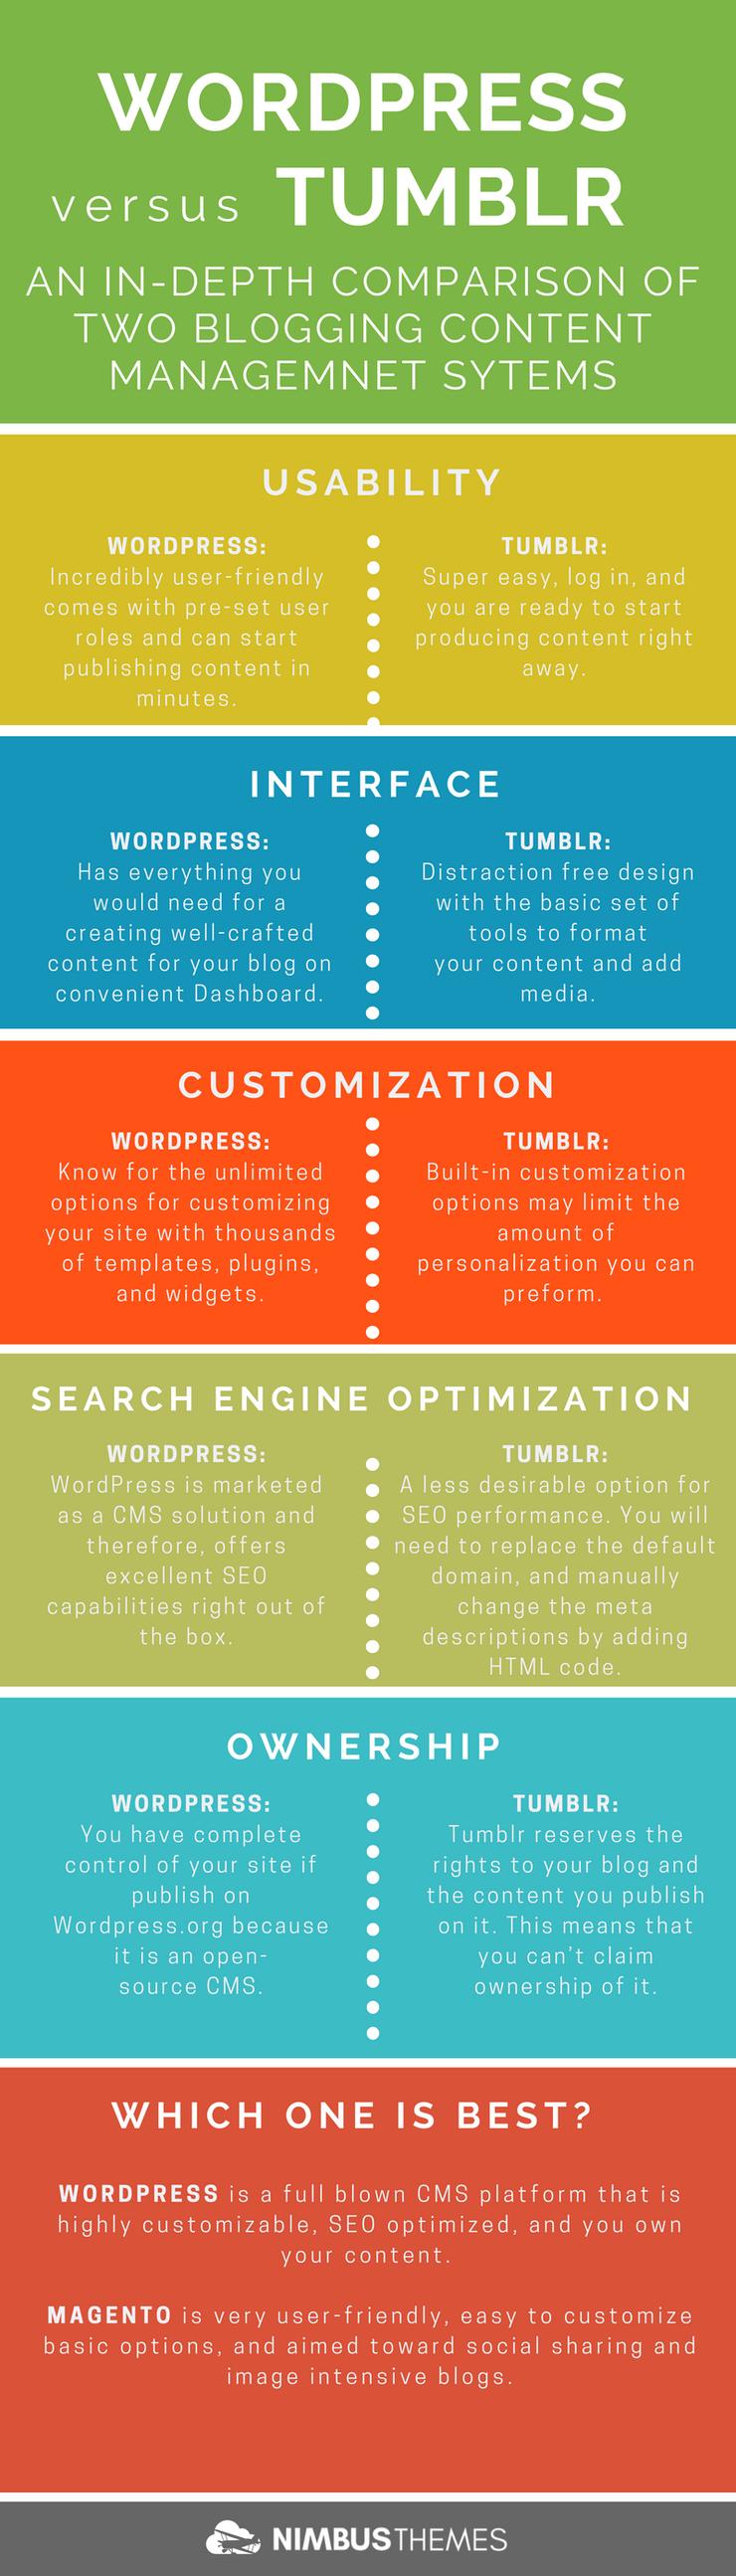 Infographic: WordPress versus Tumblr